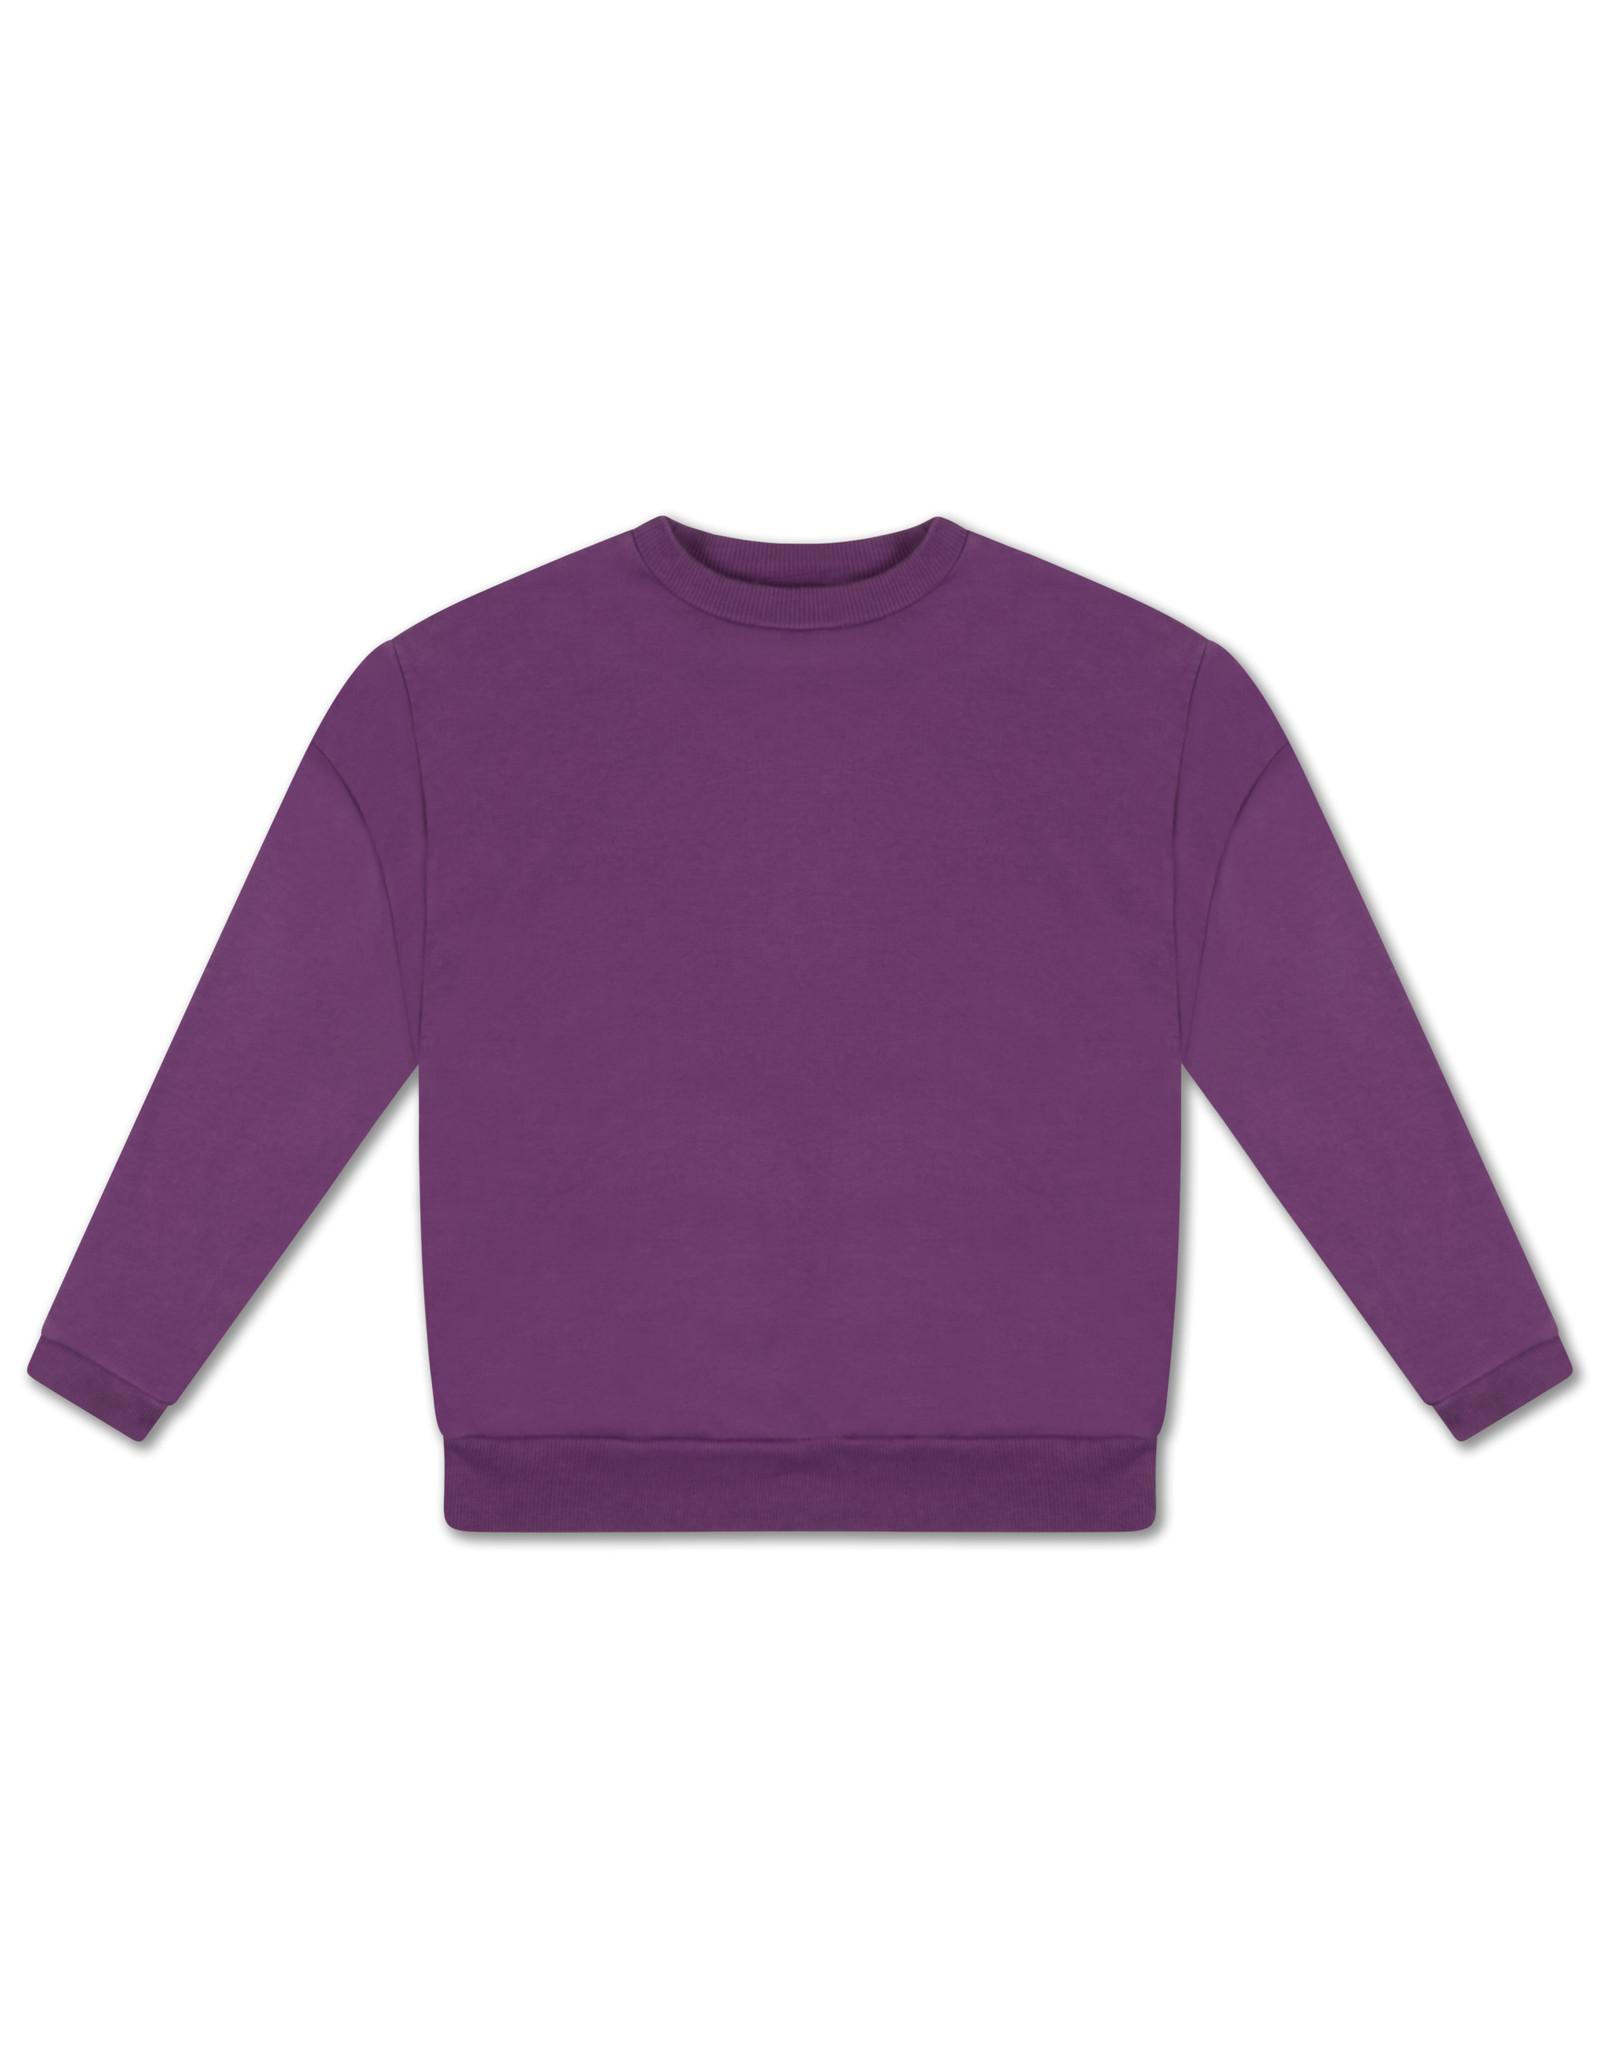 Repose Repose FW21 10 crewneck sweat purple magic